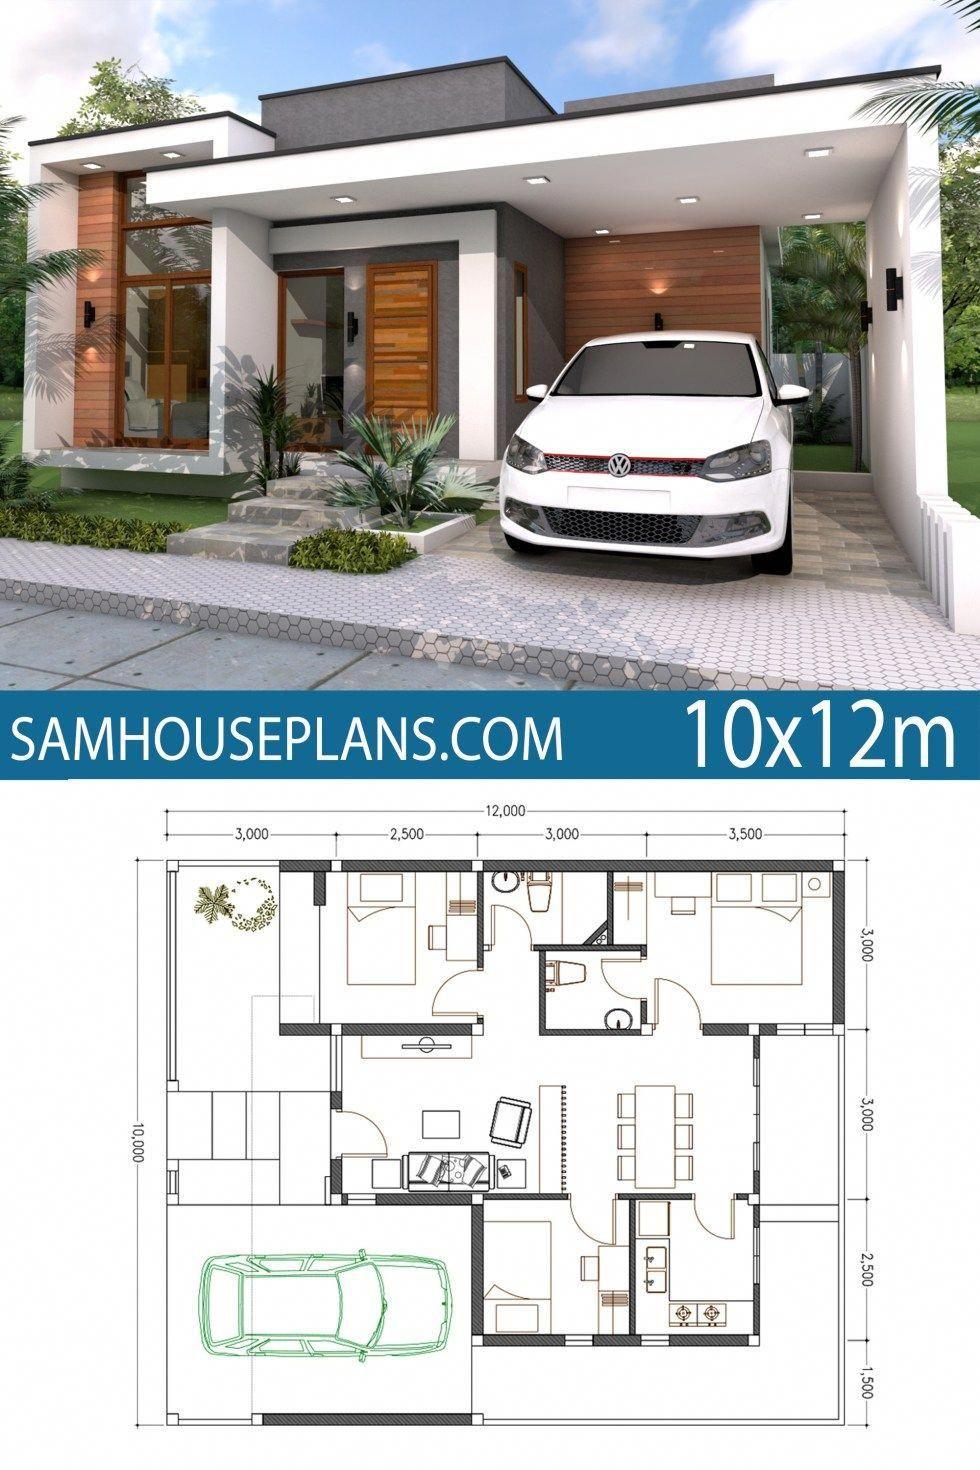 Home Plan 10x12m 3 Bedrooms Sam House Plans Houseinterior Contemporary House Plans Minimalist House Design Model House Plan